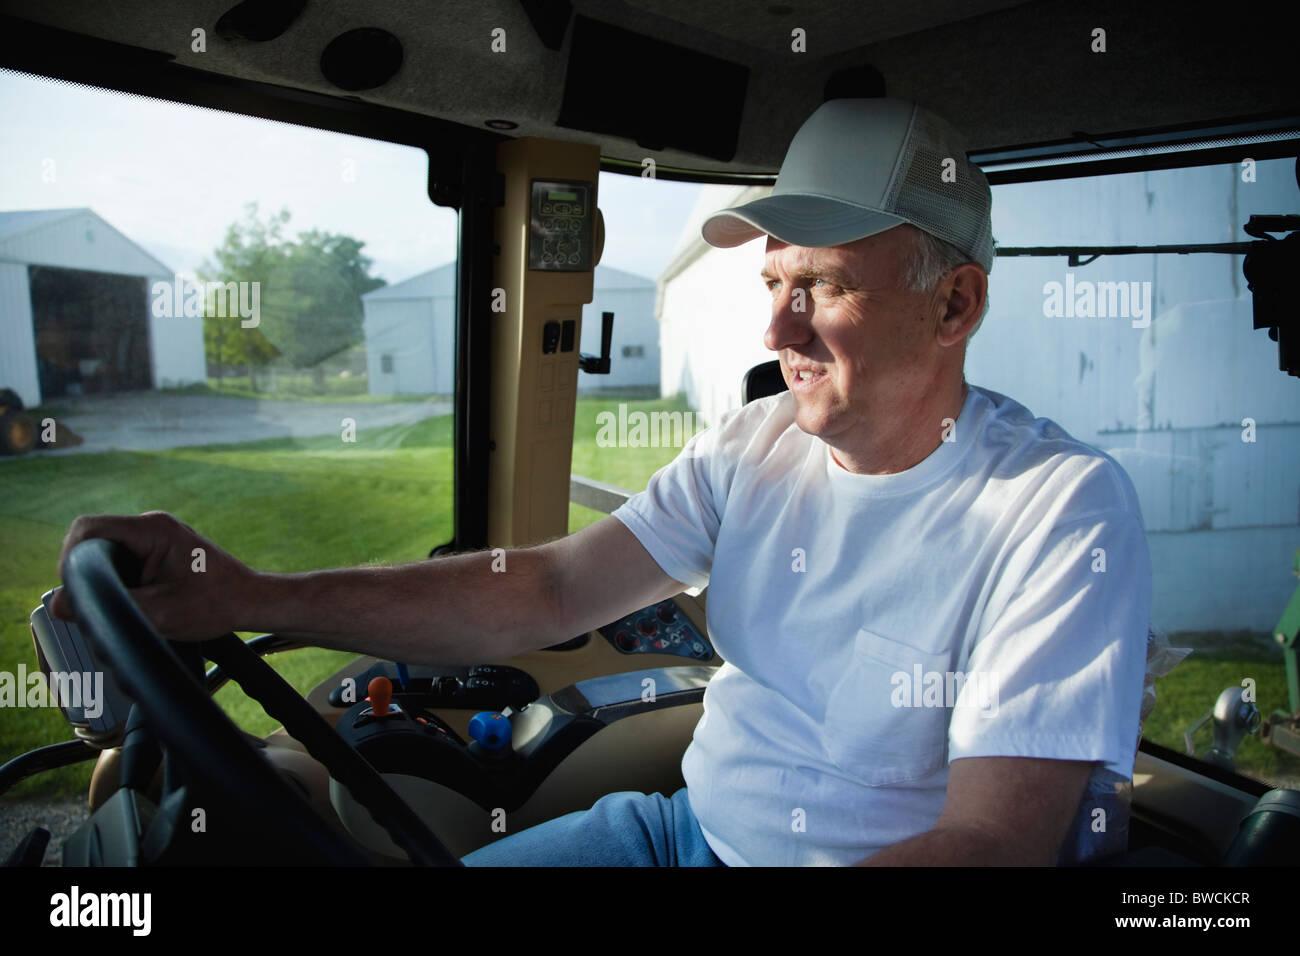 USA, Illinois, Metamora, Farmer driving tractor on farm - Stock Image